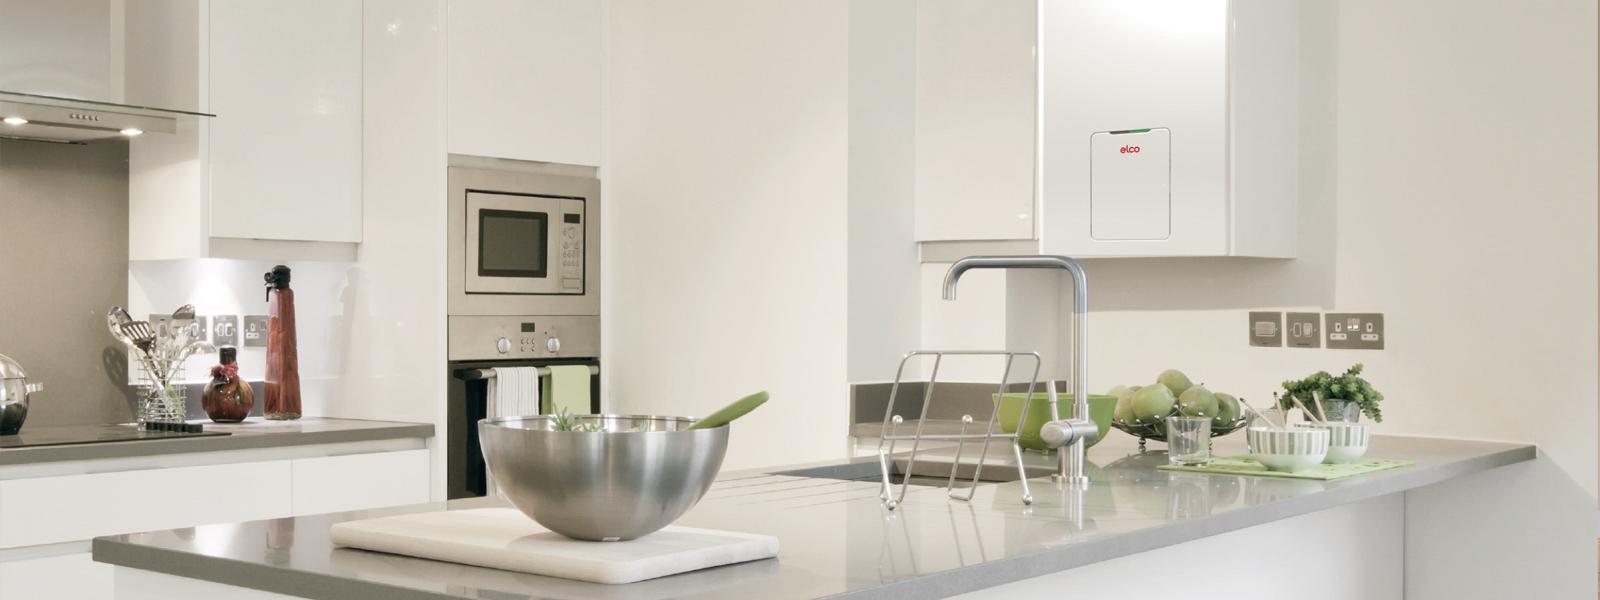 musculus heizung in bergisch gladbach. Black Bedroom Furniture Sets. Home Design Ideas